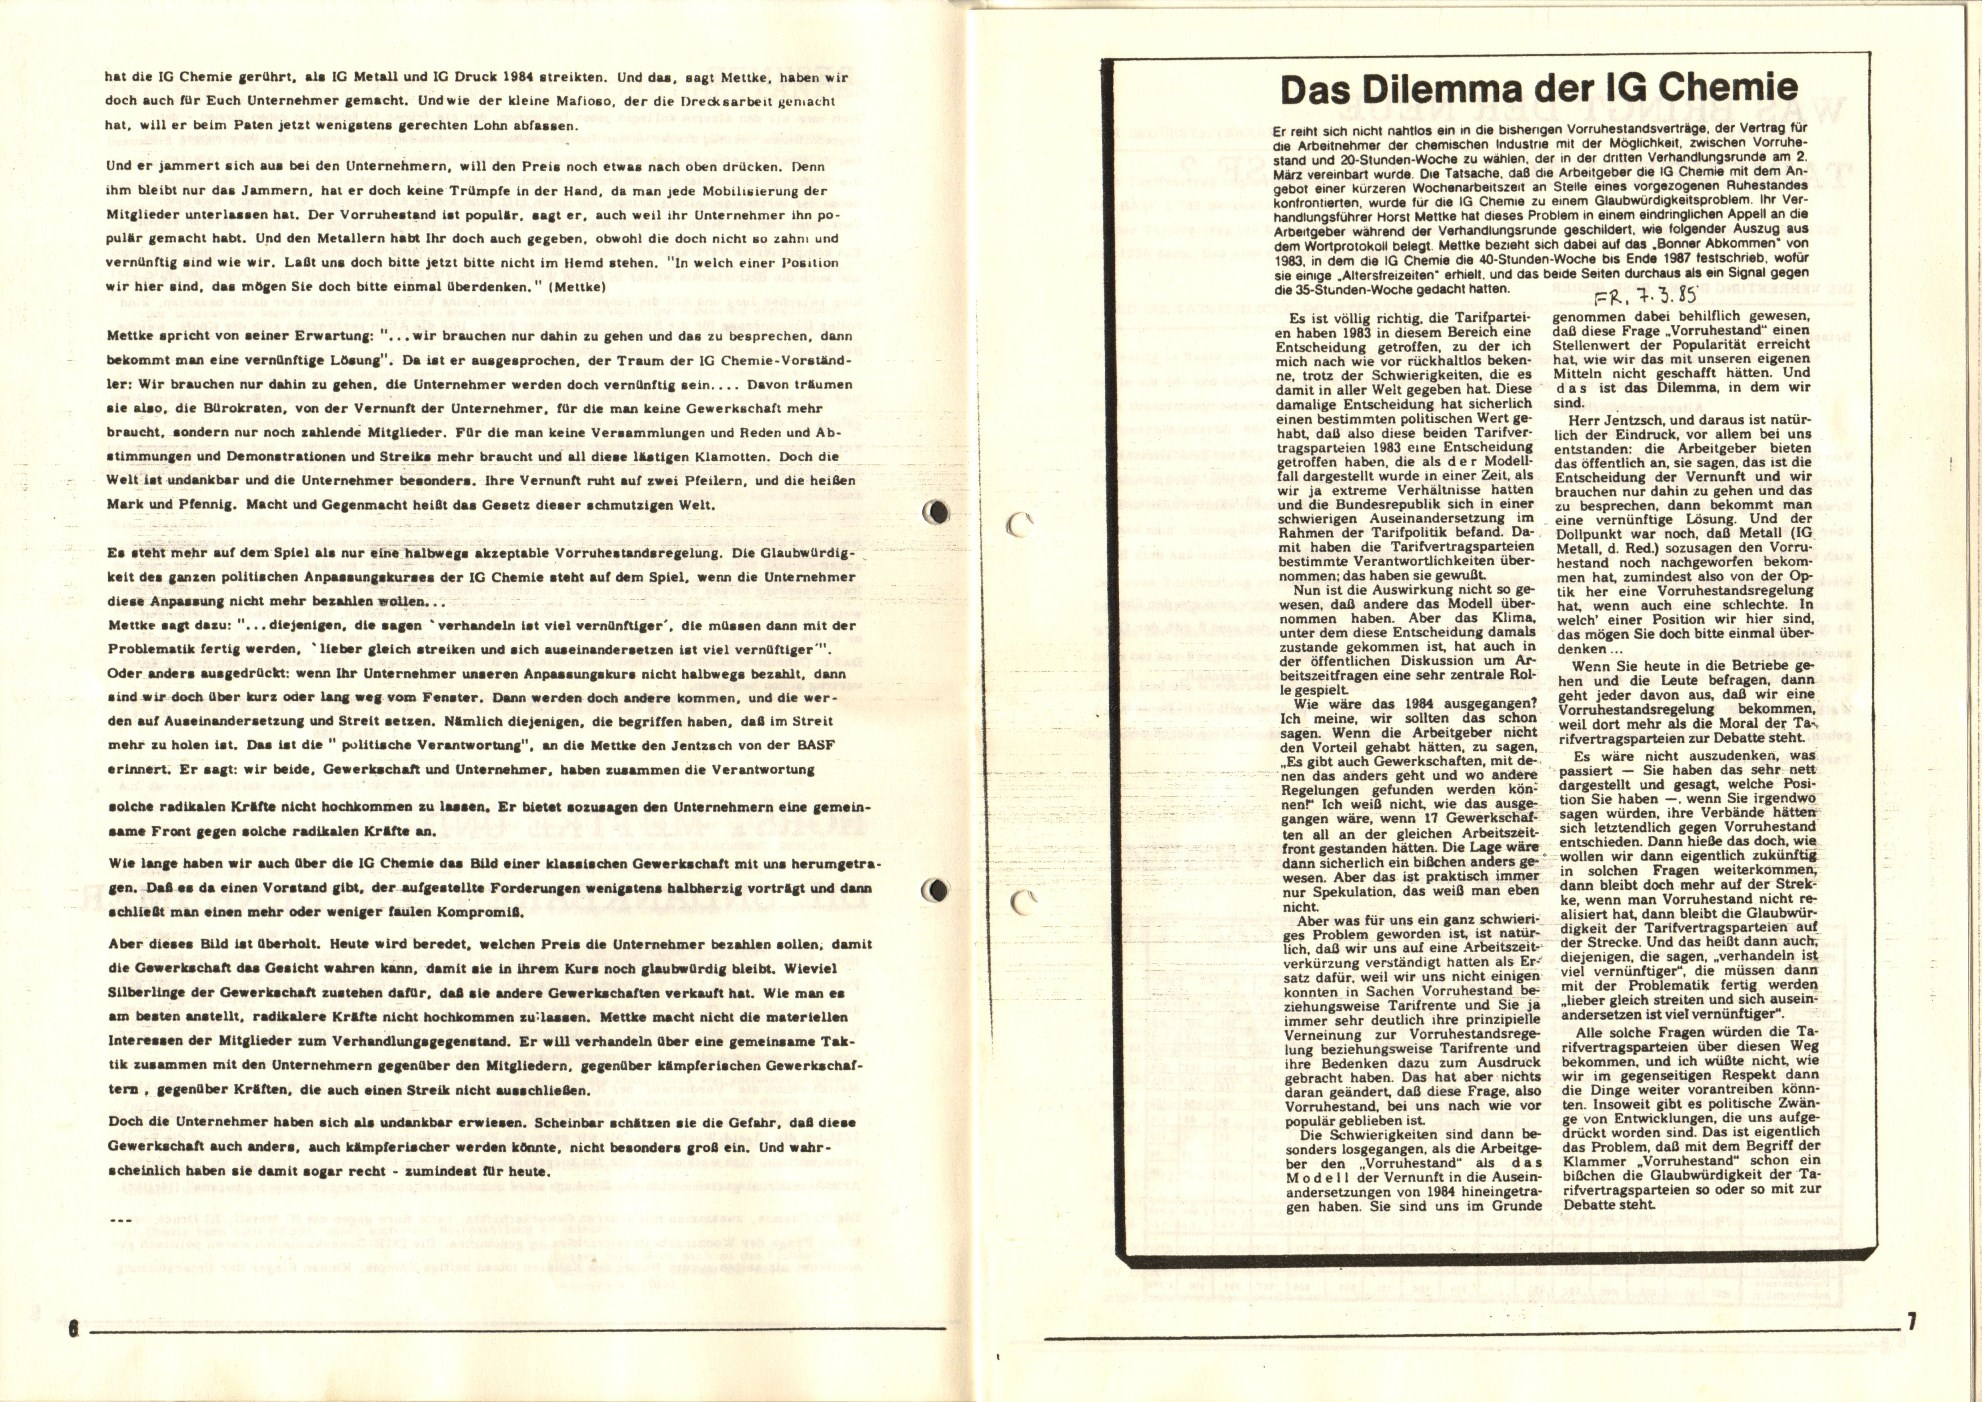 Ludwigshafen_BASF_Chemie_Tarifrunde_1985_04